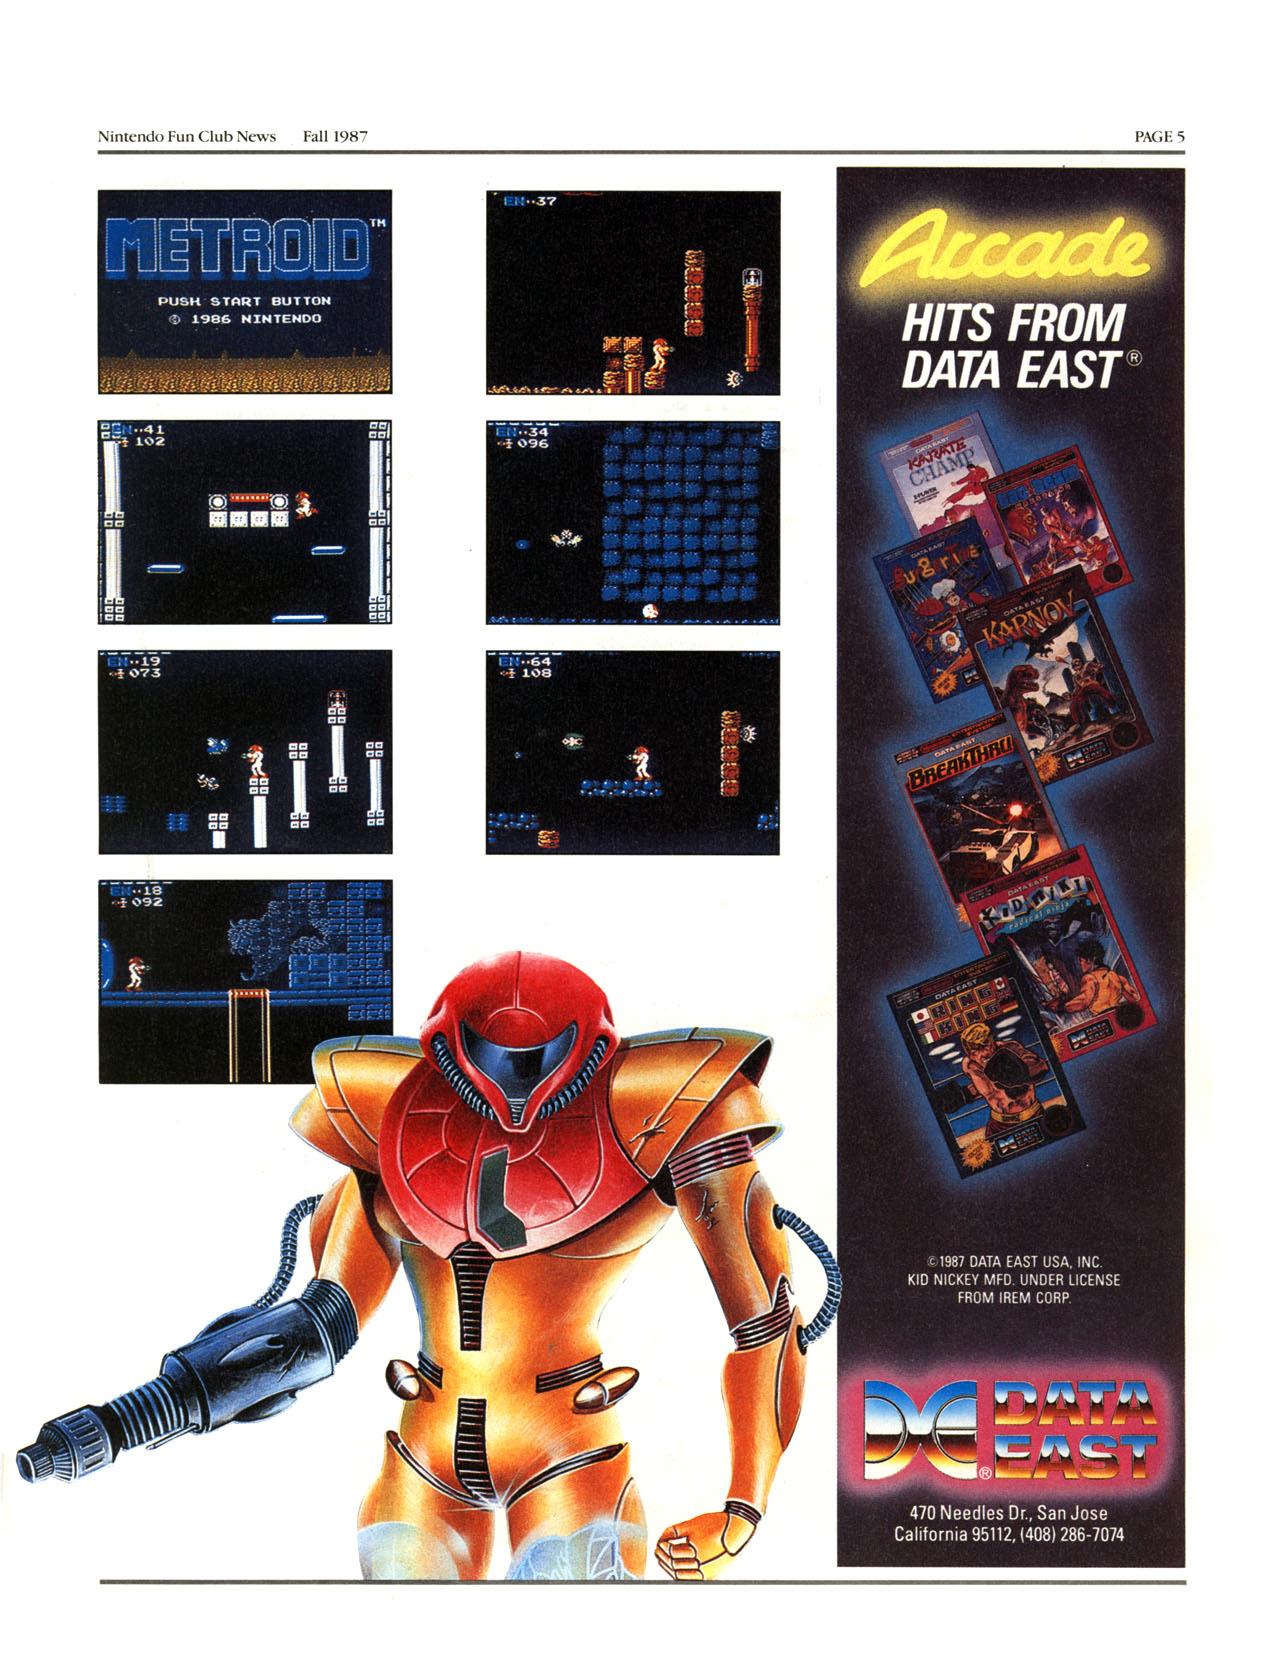 Nintendo Fun Club News - Fall 1987 - p5